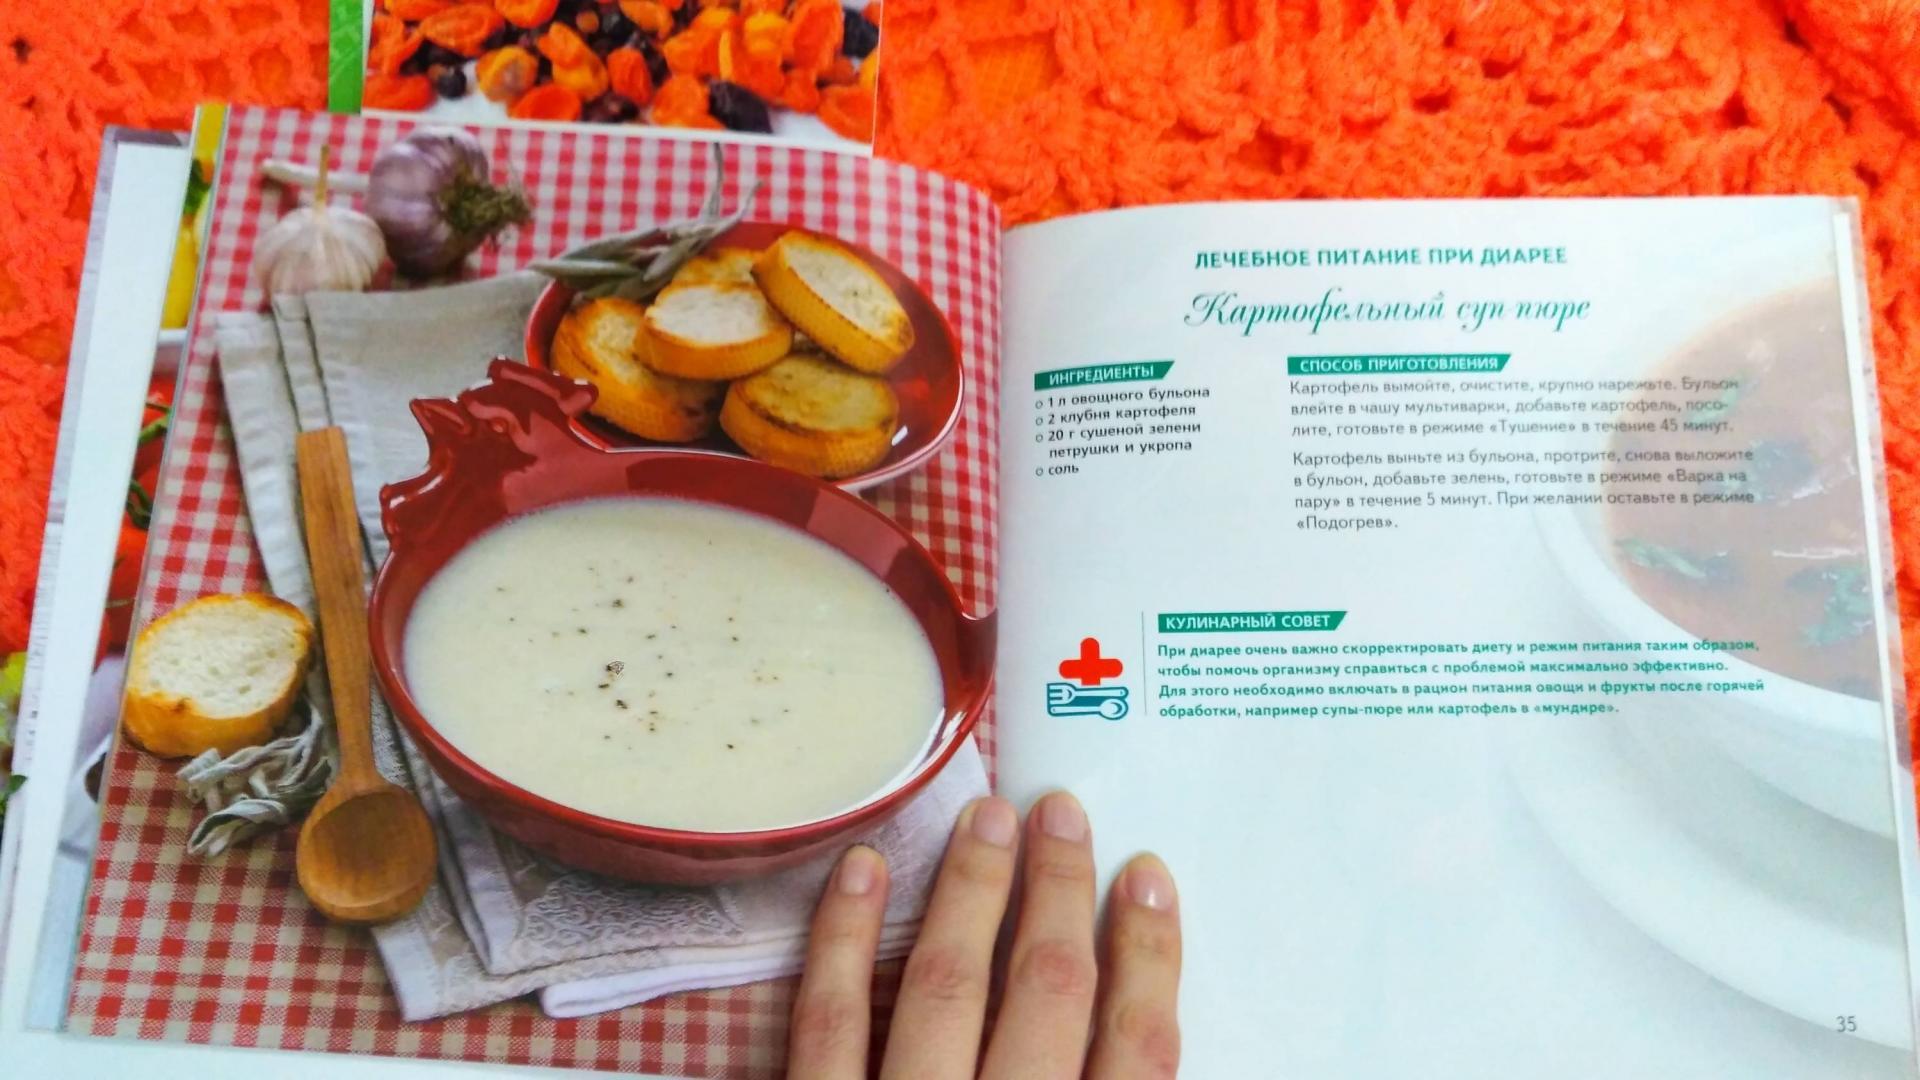 Справочник по лечебному питанию диета 1